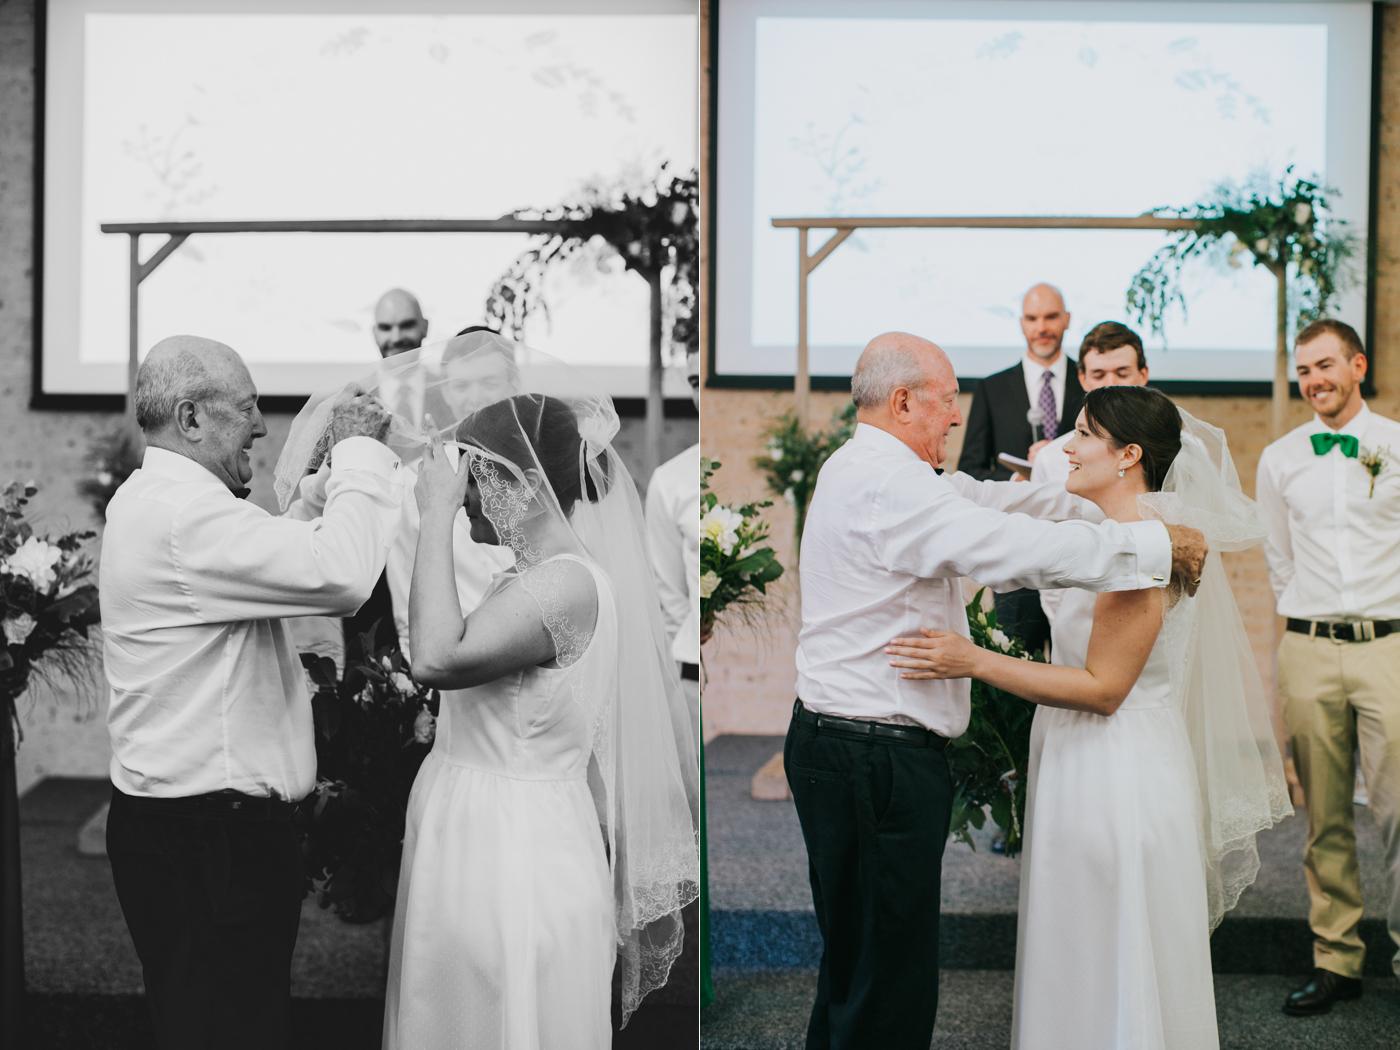 Nicolle & Jacob - Dubbo Wedding - Country Australia - Samantha Heather Photography-98.jpg